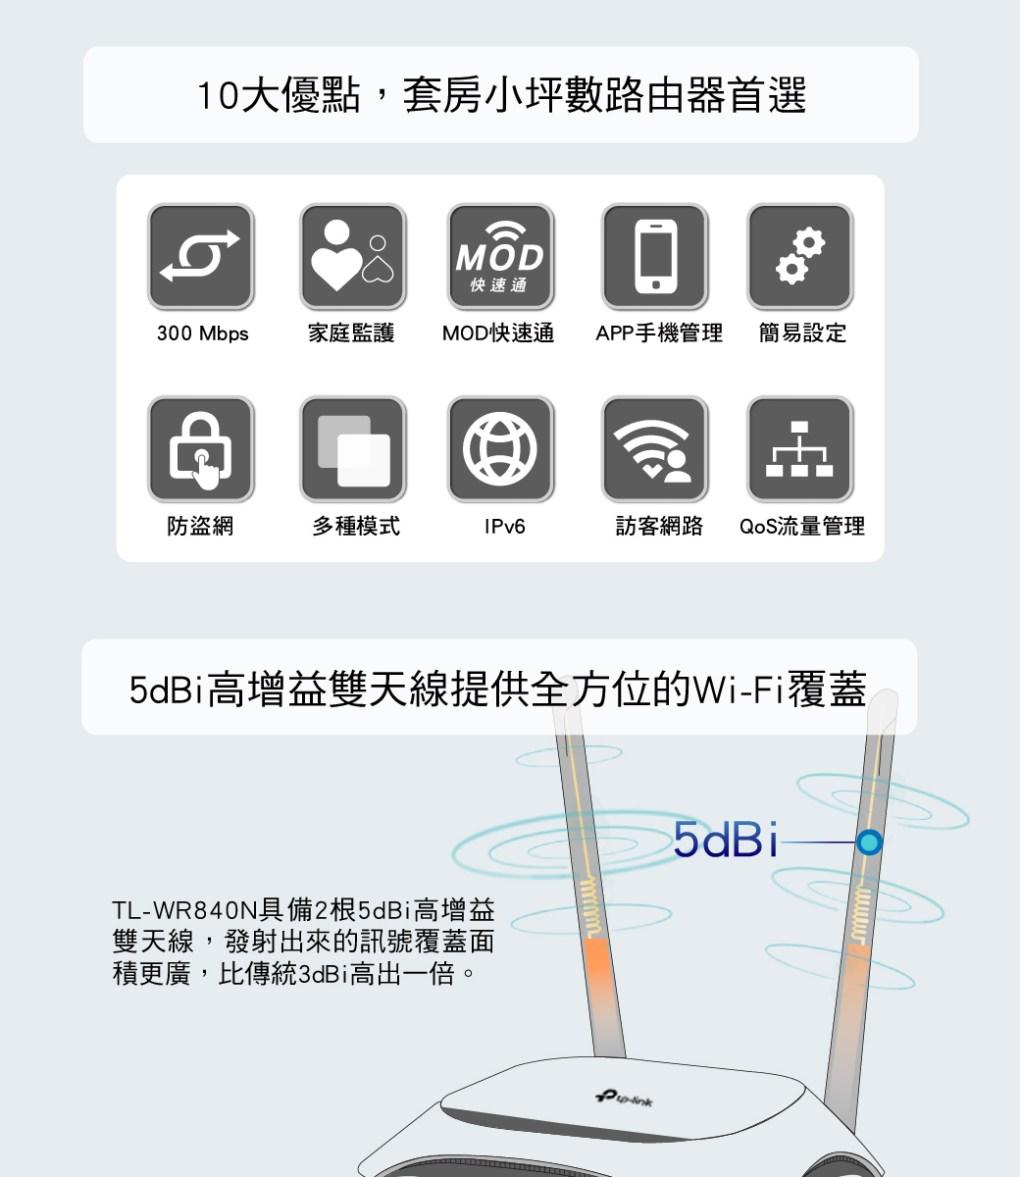 TP-Link TL-WR840N 300Mbps 無線網路 WiFi 路由器(分享器) - TP Link TL WR840N 10